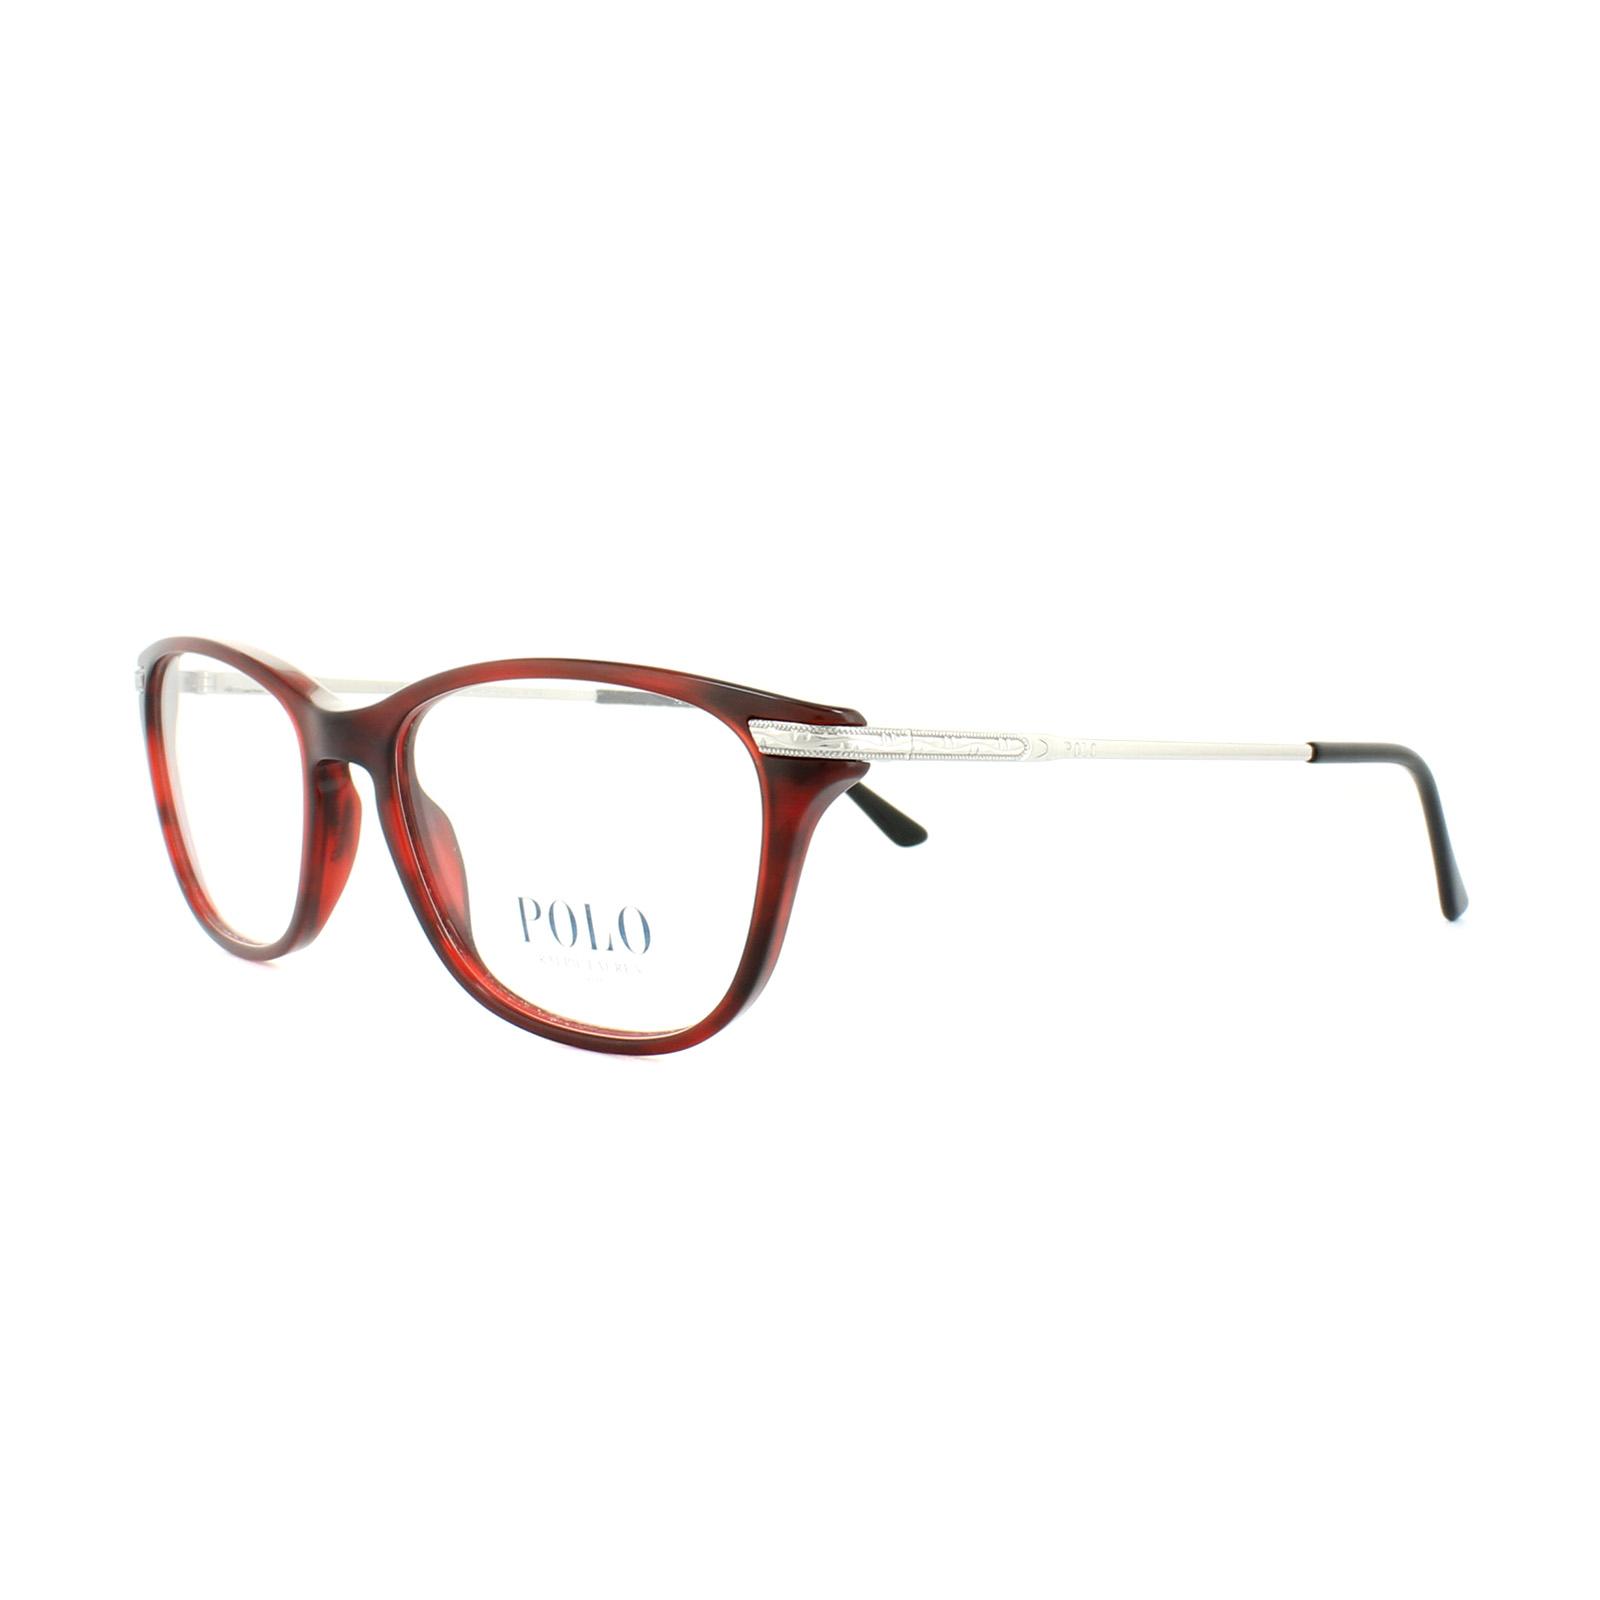 2f8424f4e4b ... closeout polo ralph lauren ph 2135 glasses frames b9f05 0ba02